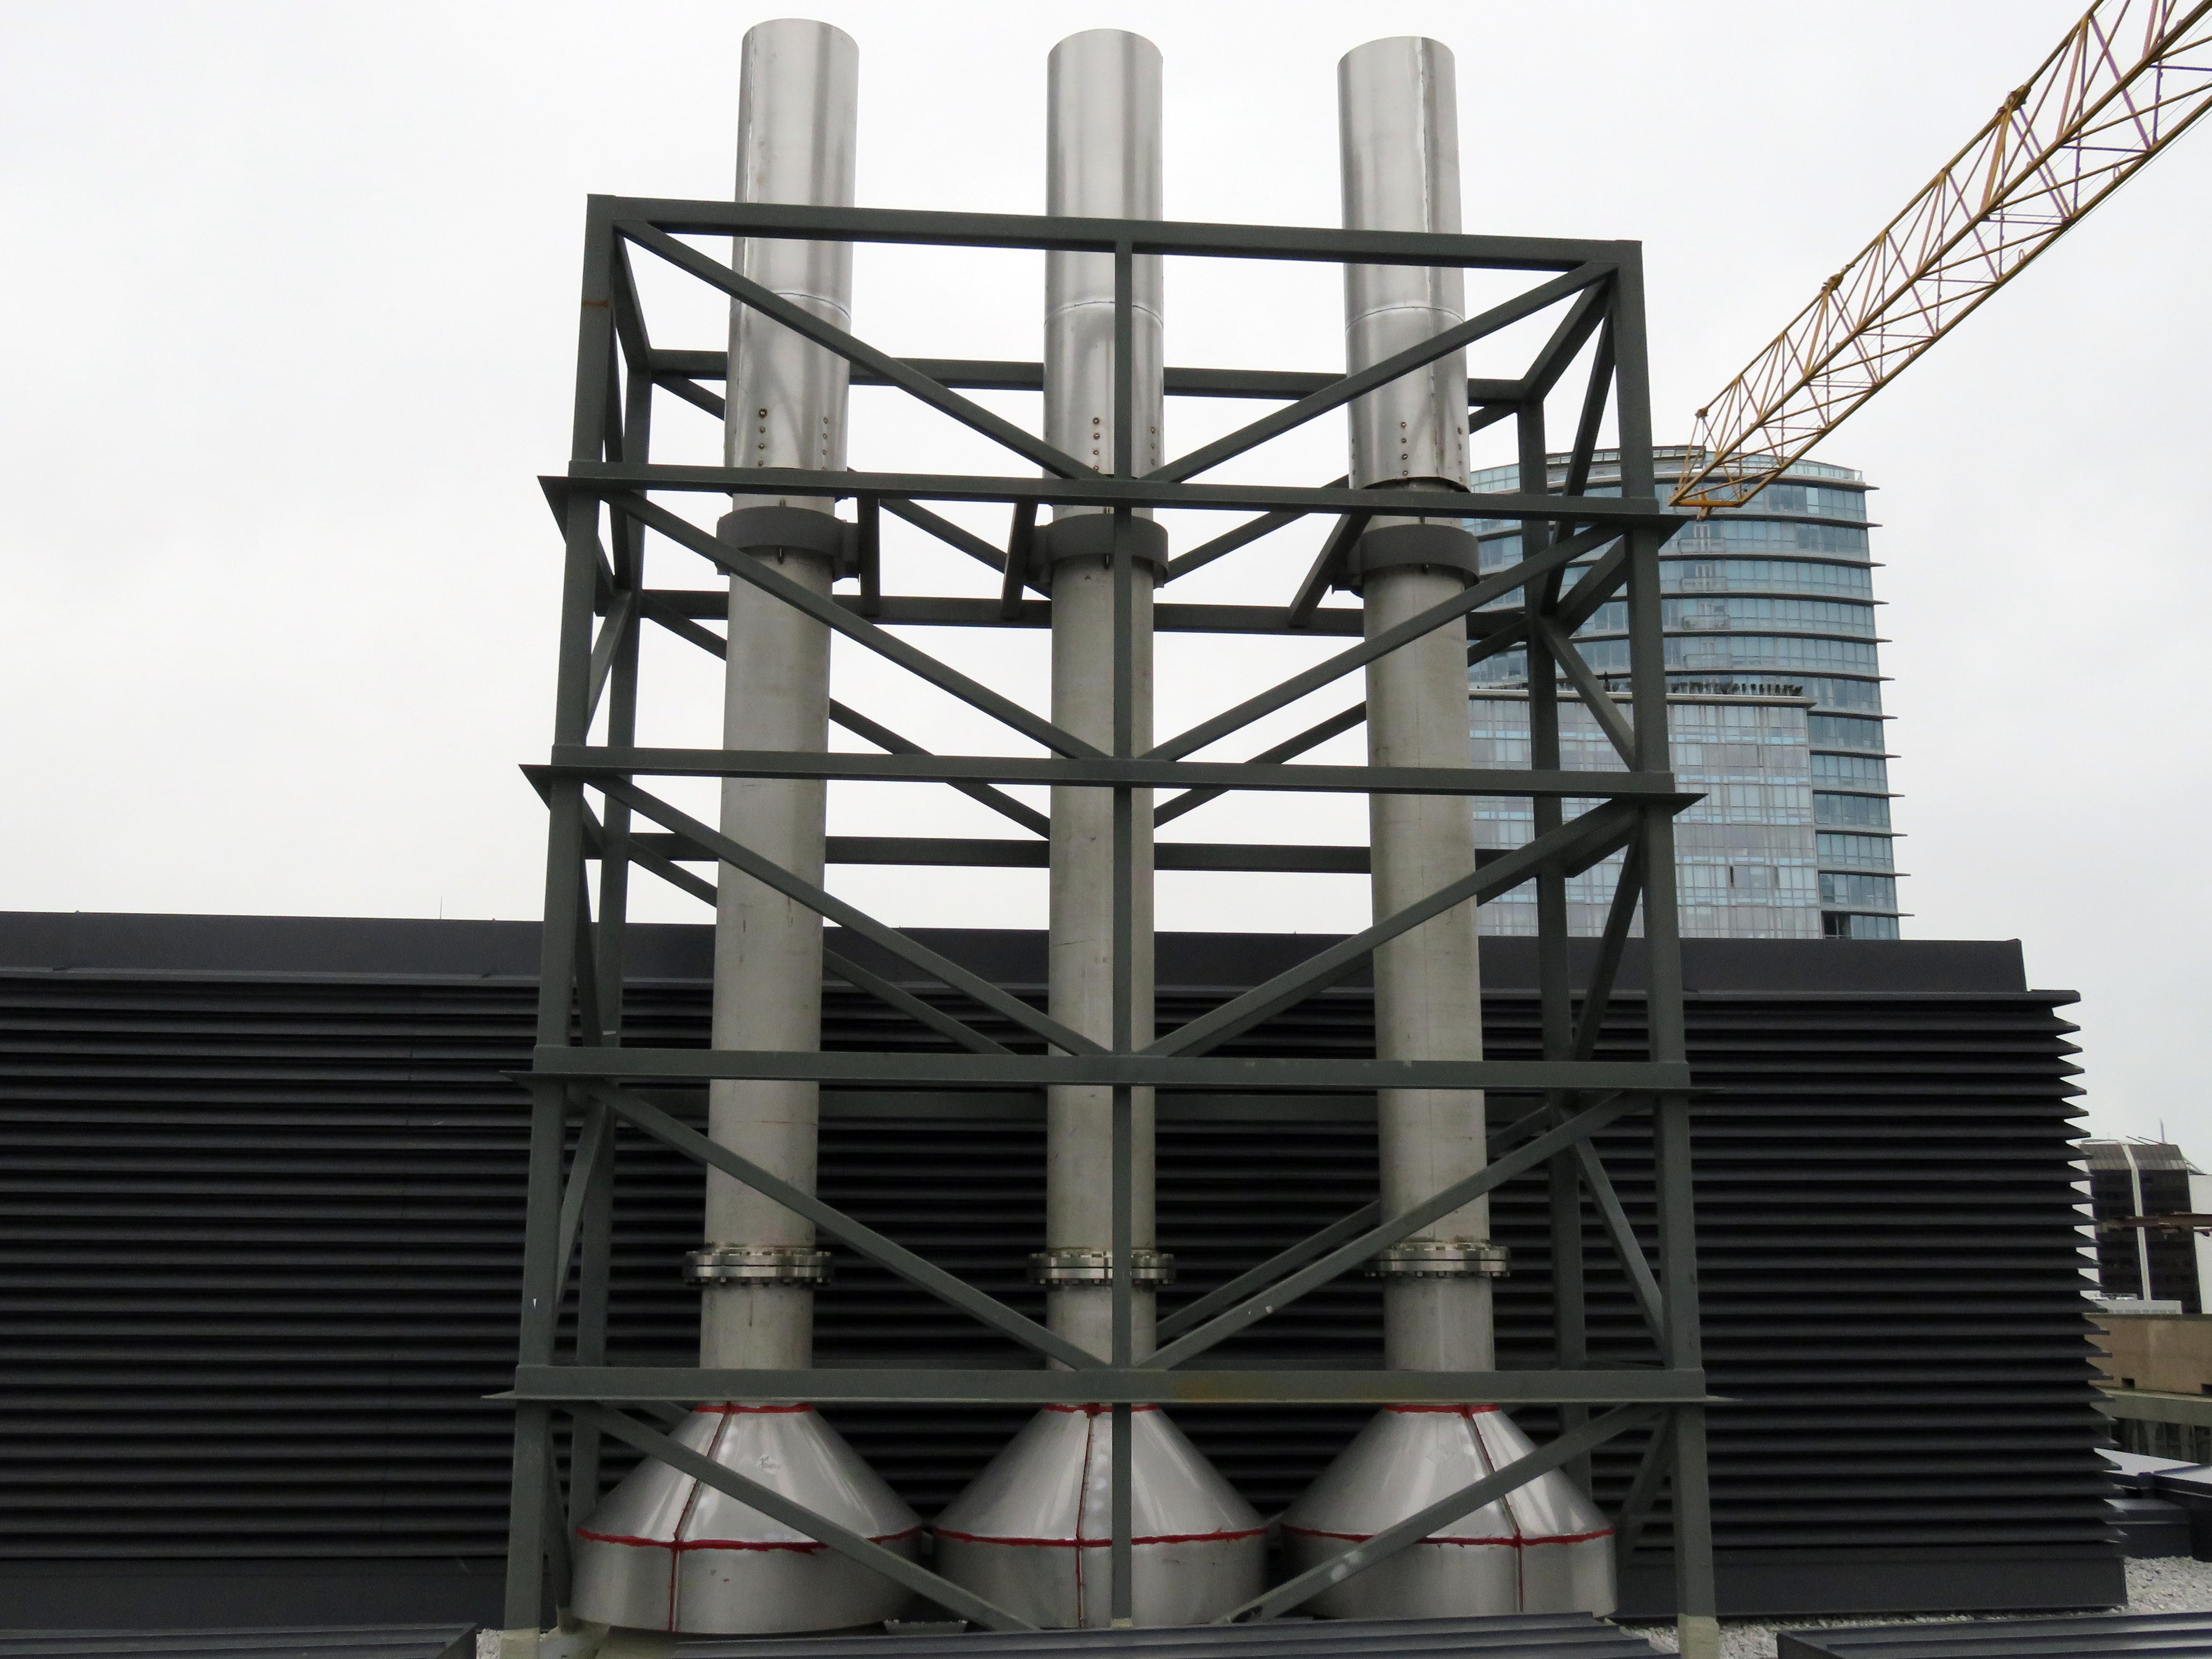 Telus Turbine SS exhaust stacks